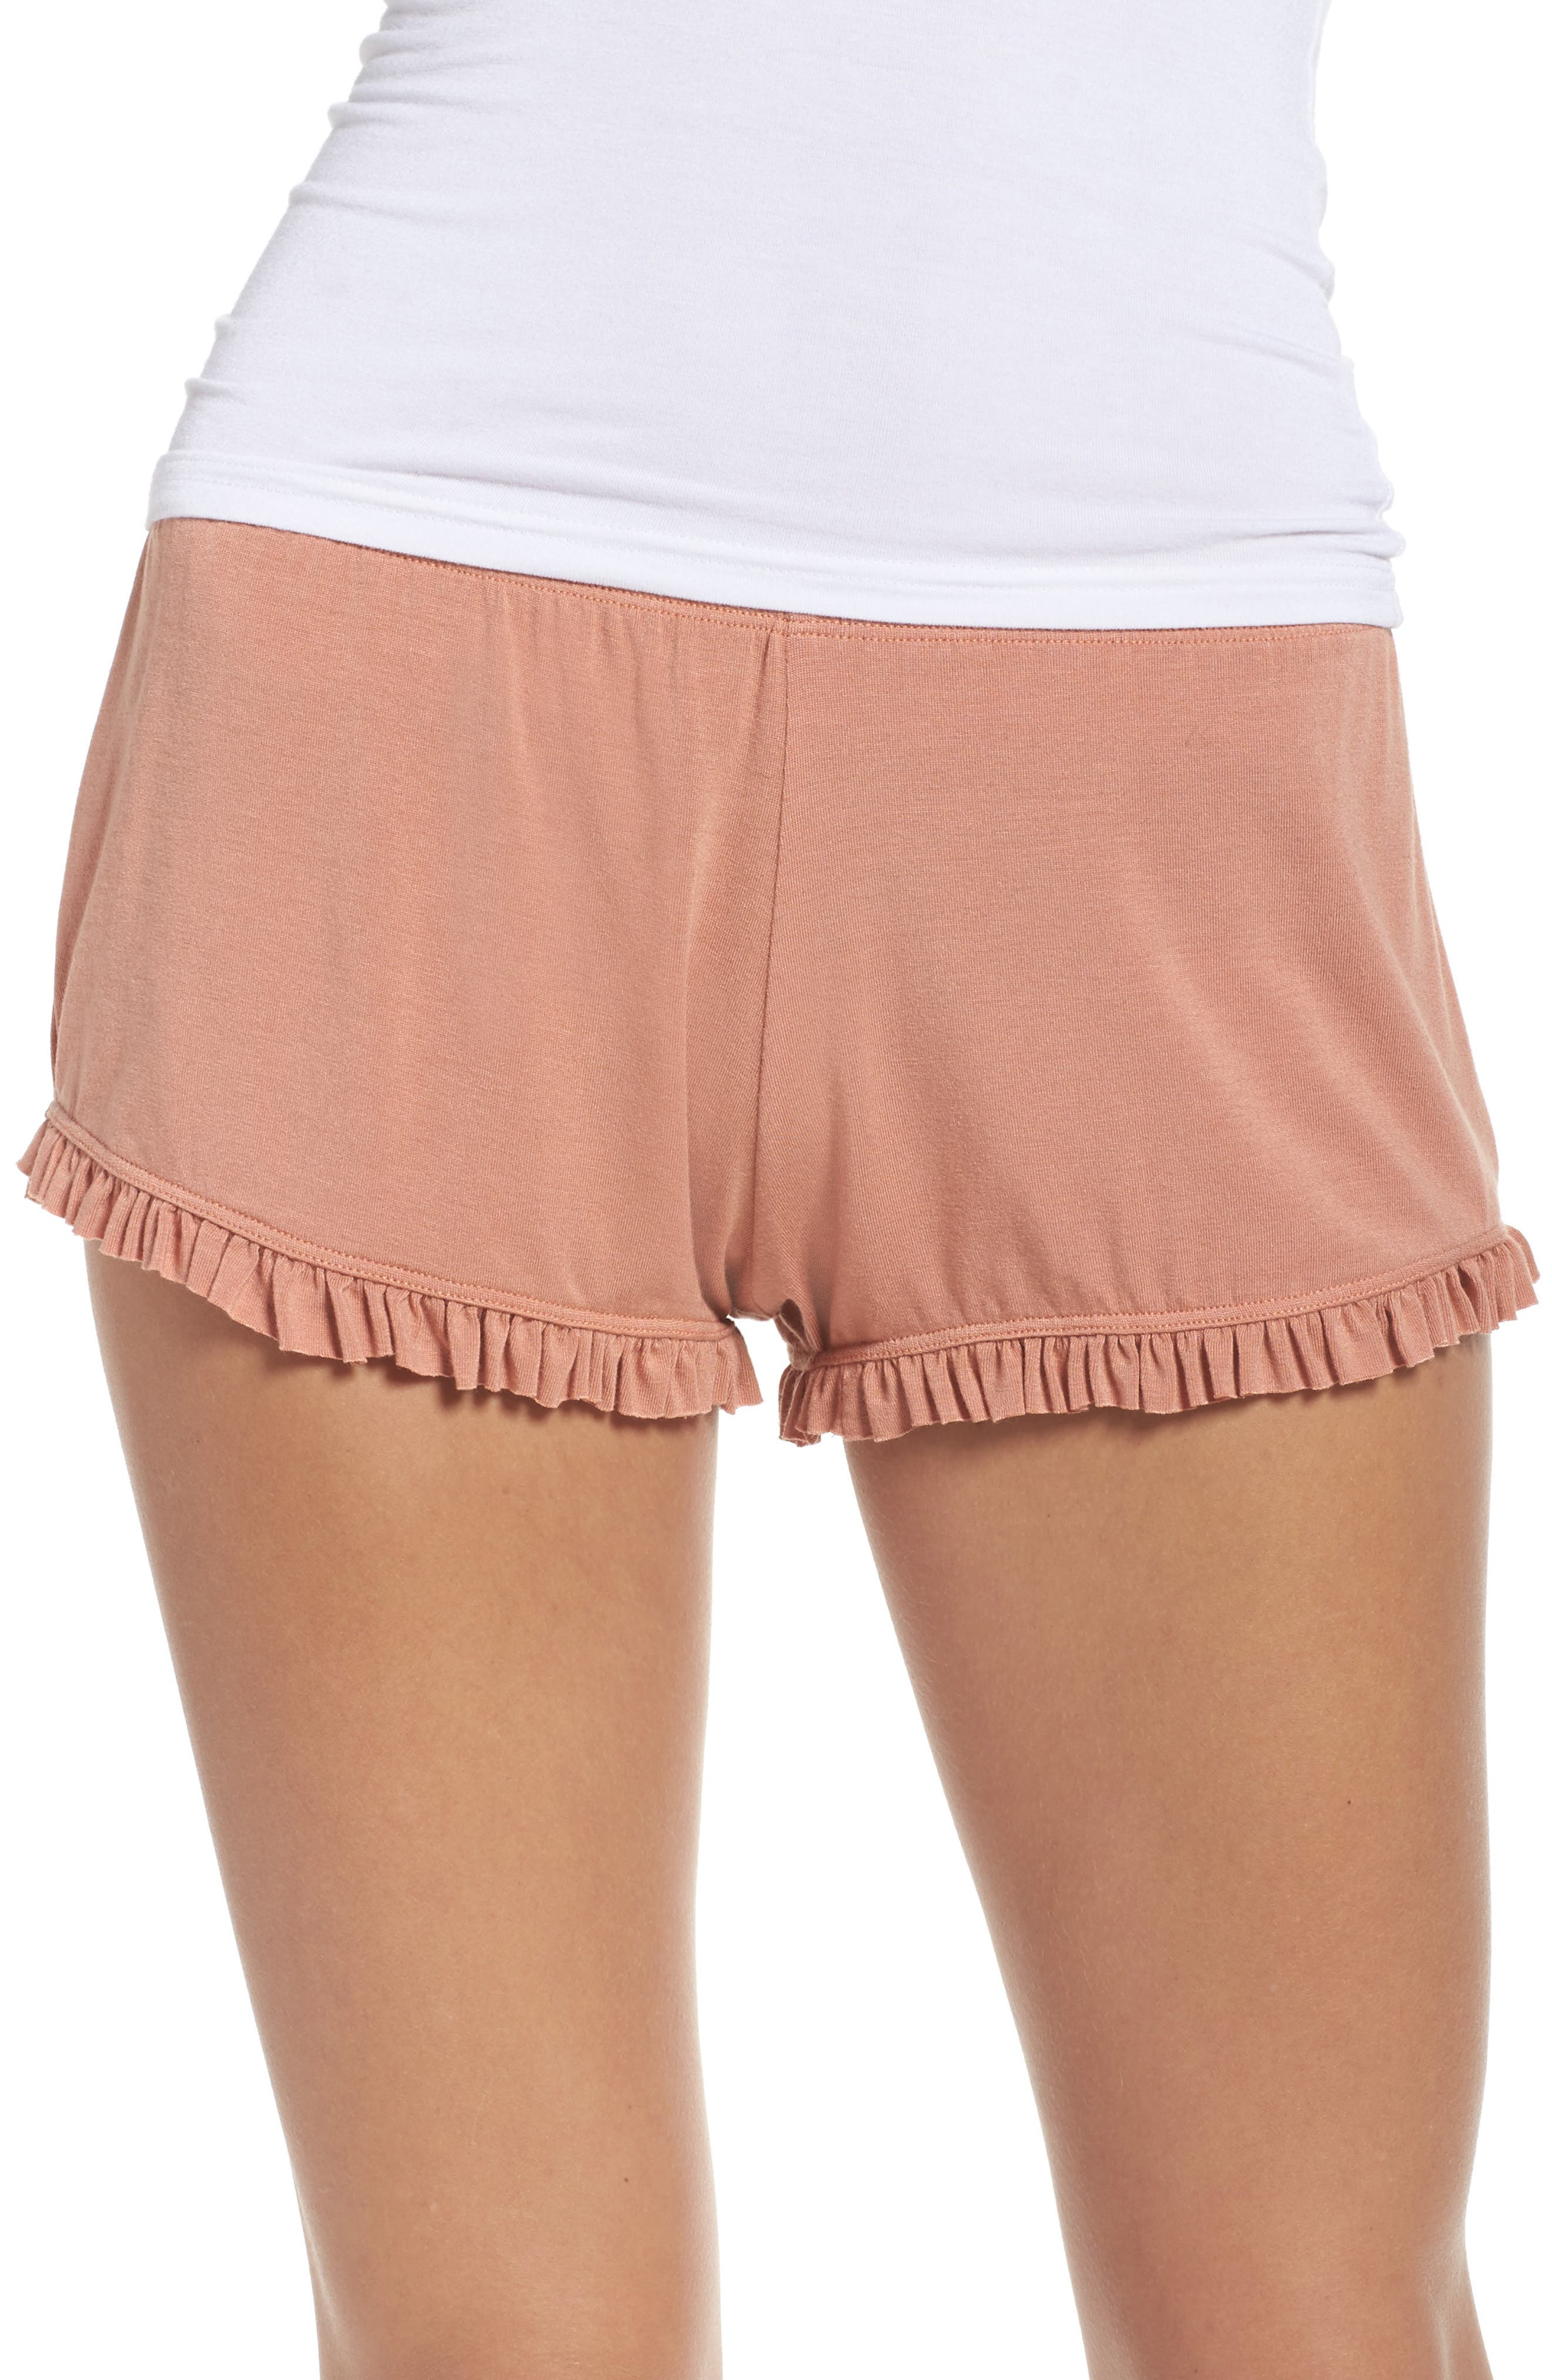 Olympia Theodora Bae Ruffle Lounge Shorts